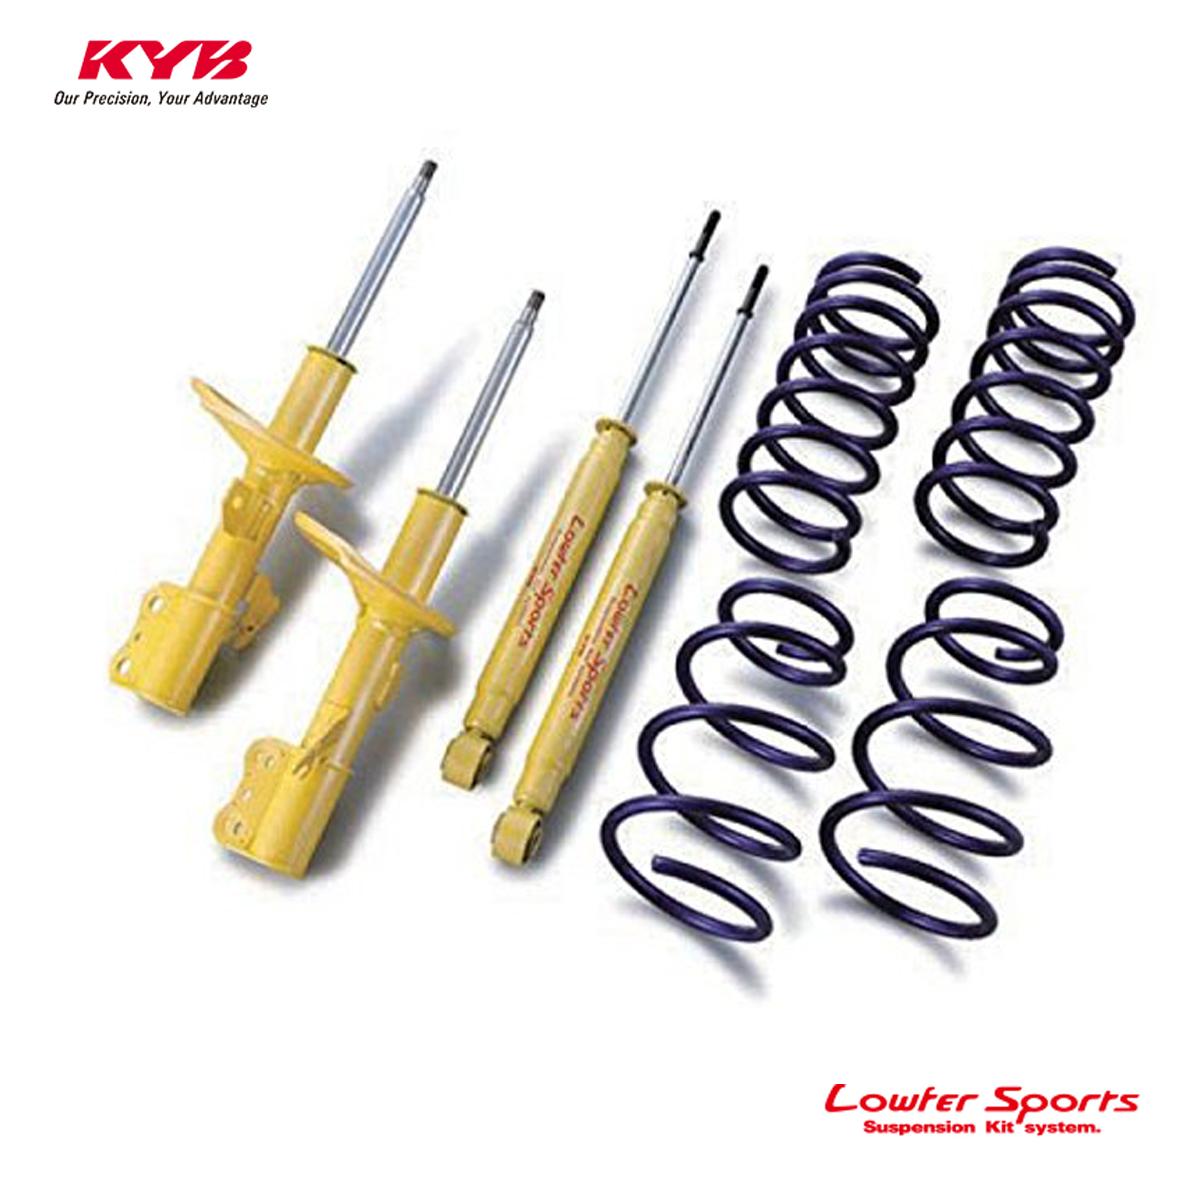 KYB カヤバ ヴィッツ KSP90/SCP90/NCP91 ショックアブソーバー サスペンションキット Lowfer Sports LKIT-KSP90 配送先条件有り